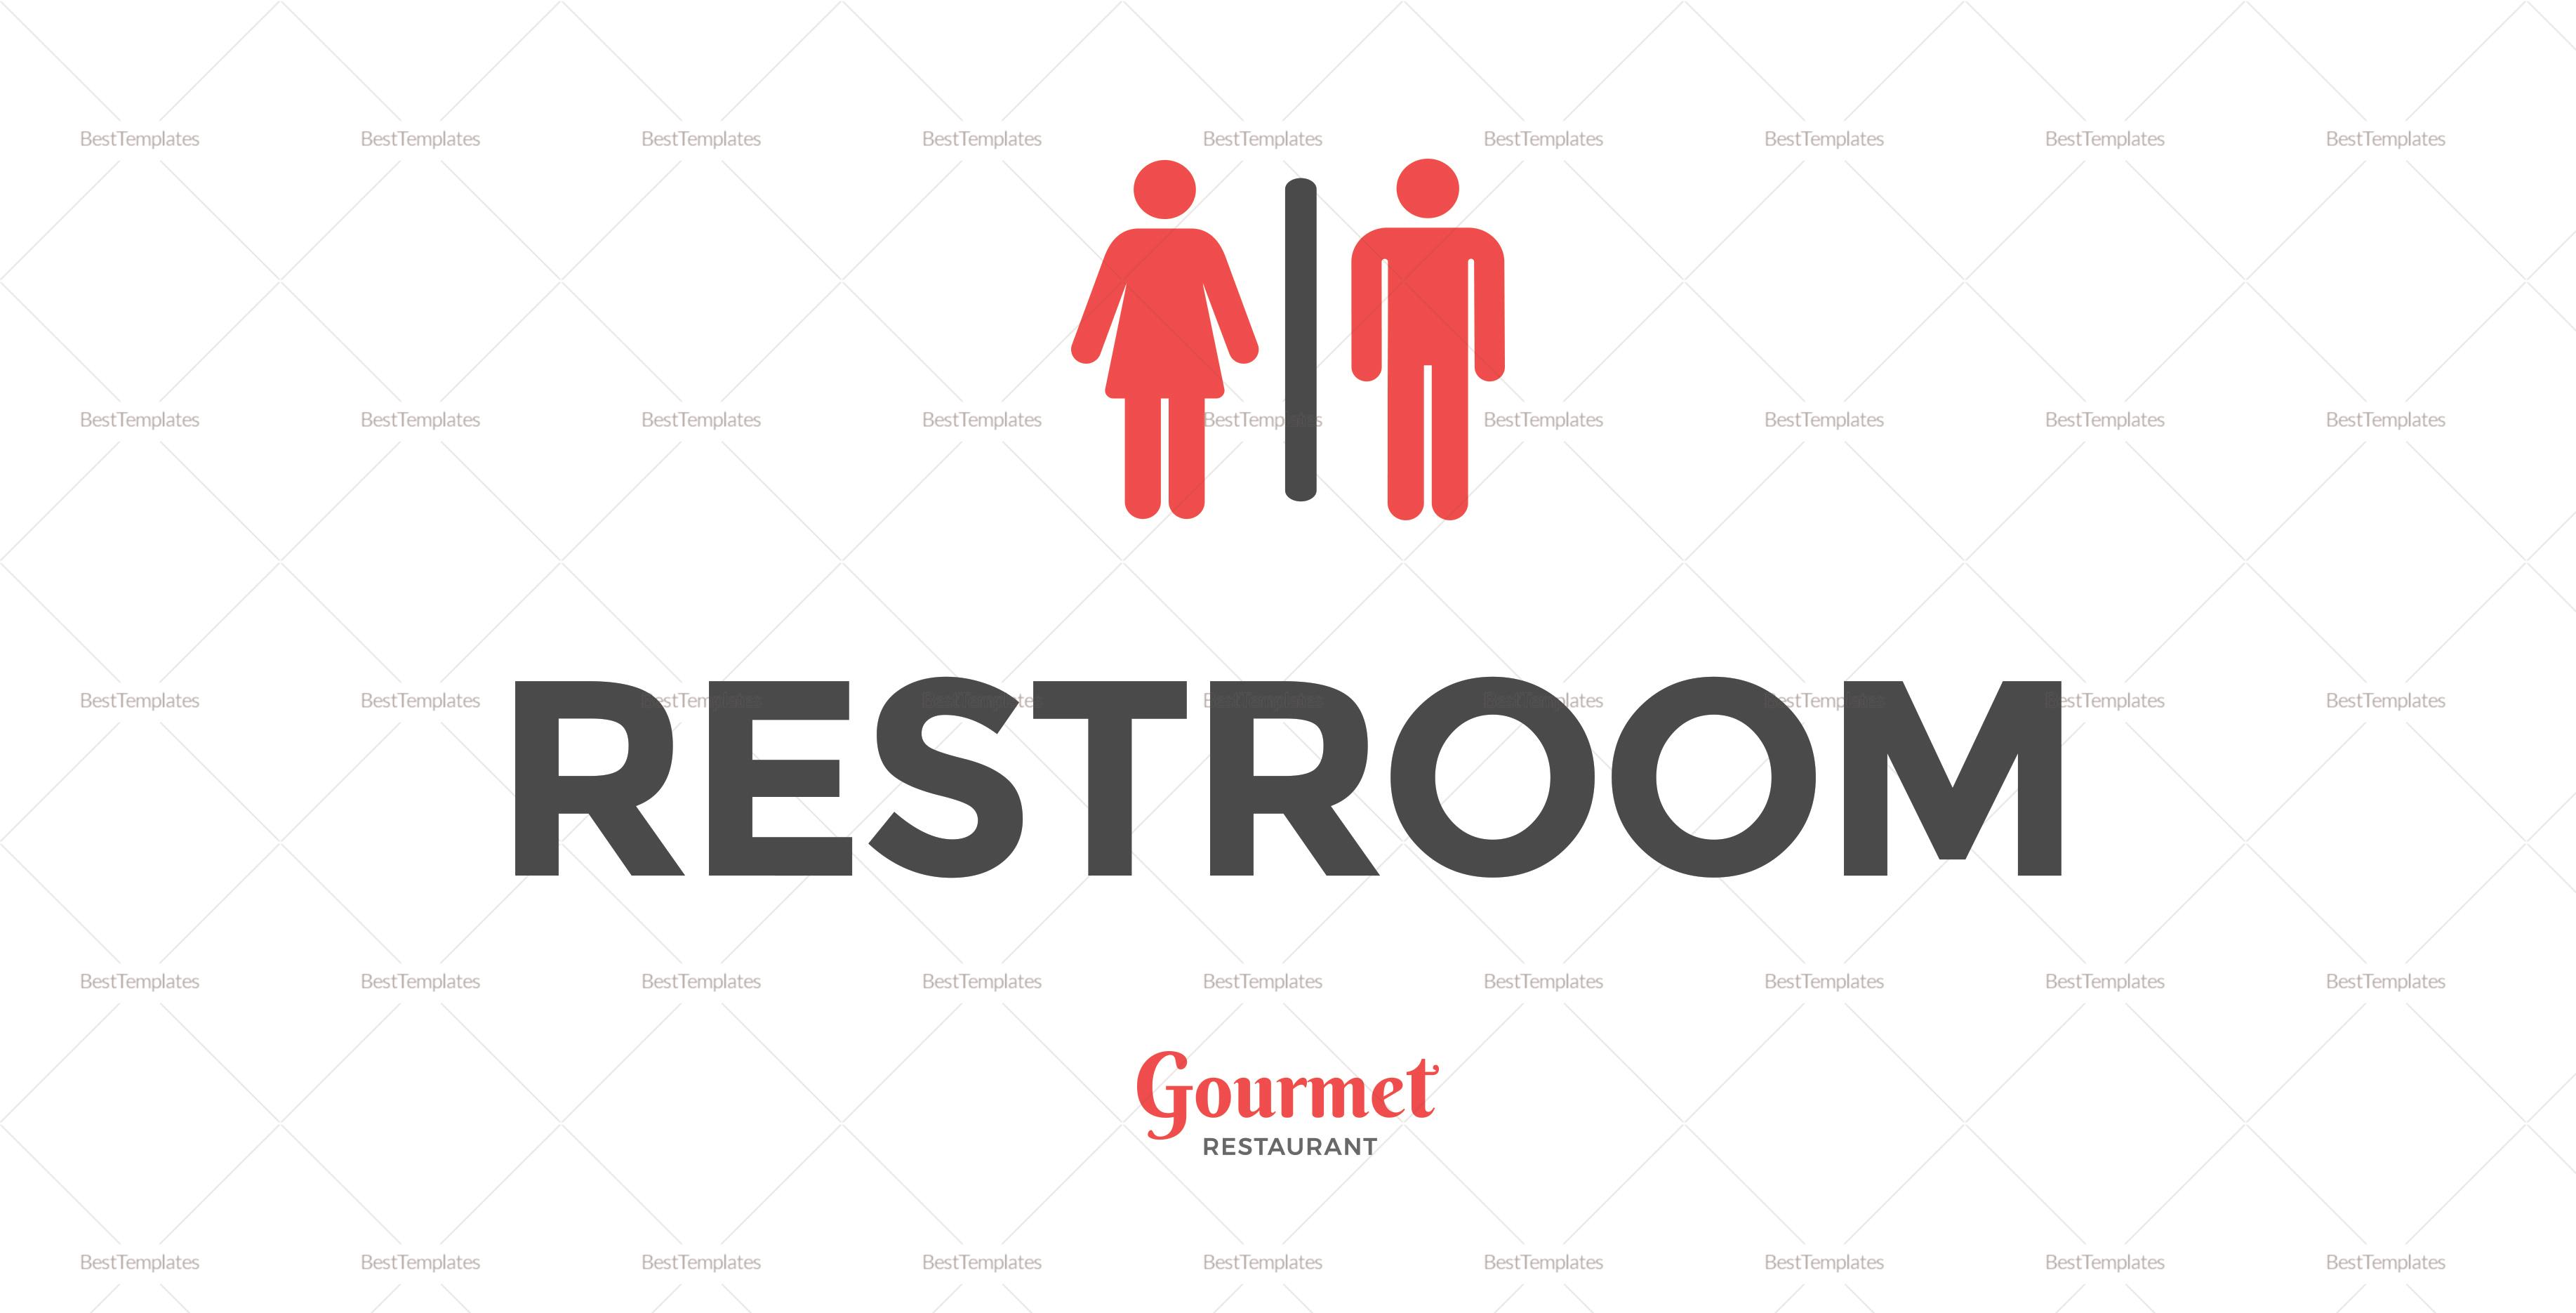 Restaurant Restroom Sign Template